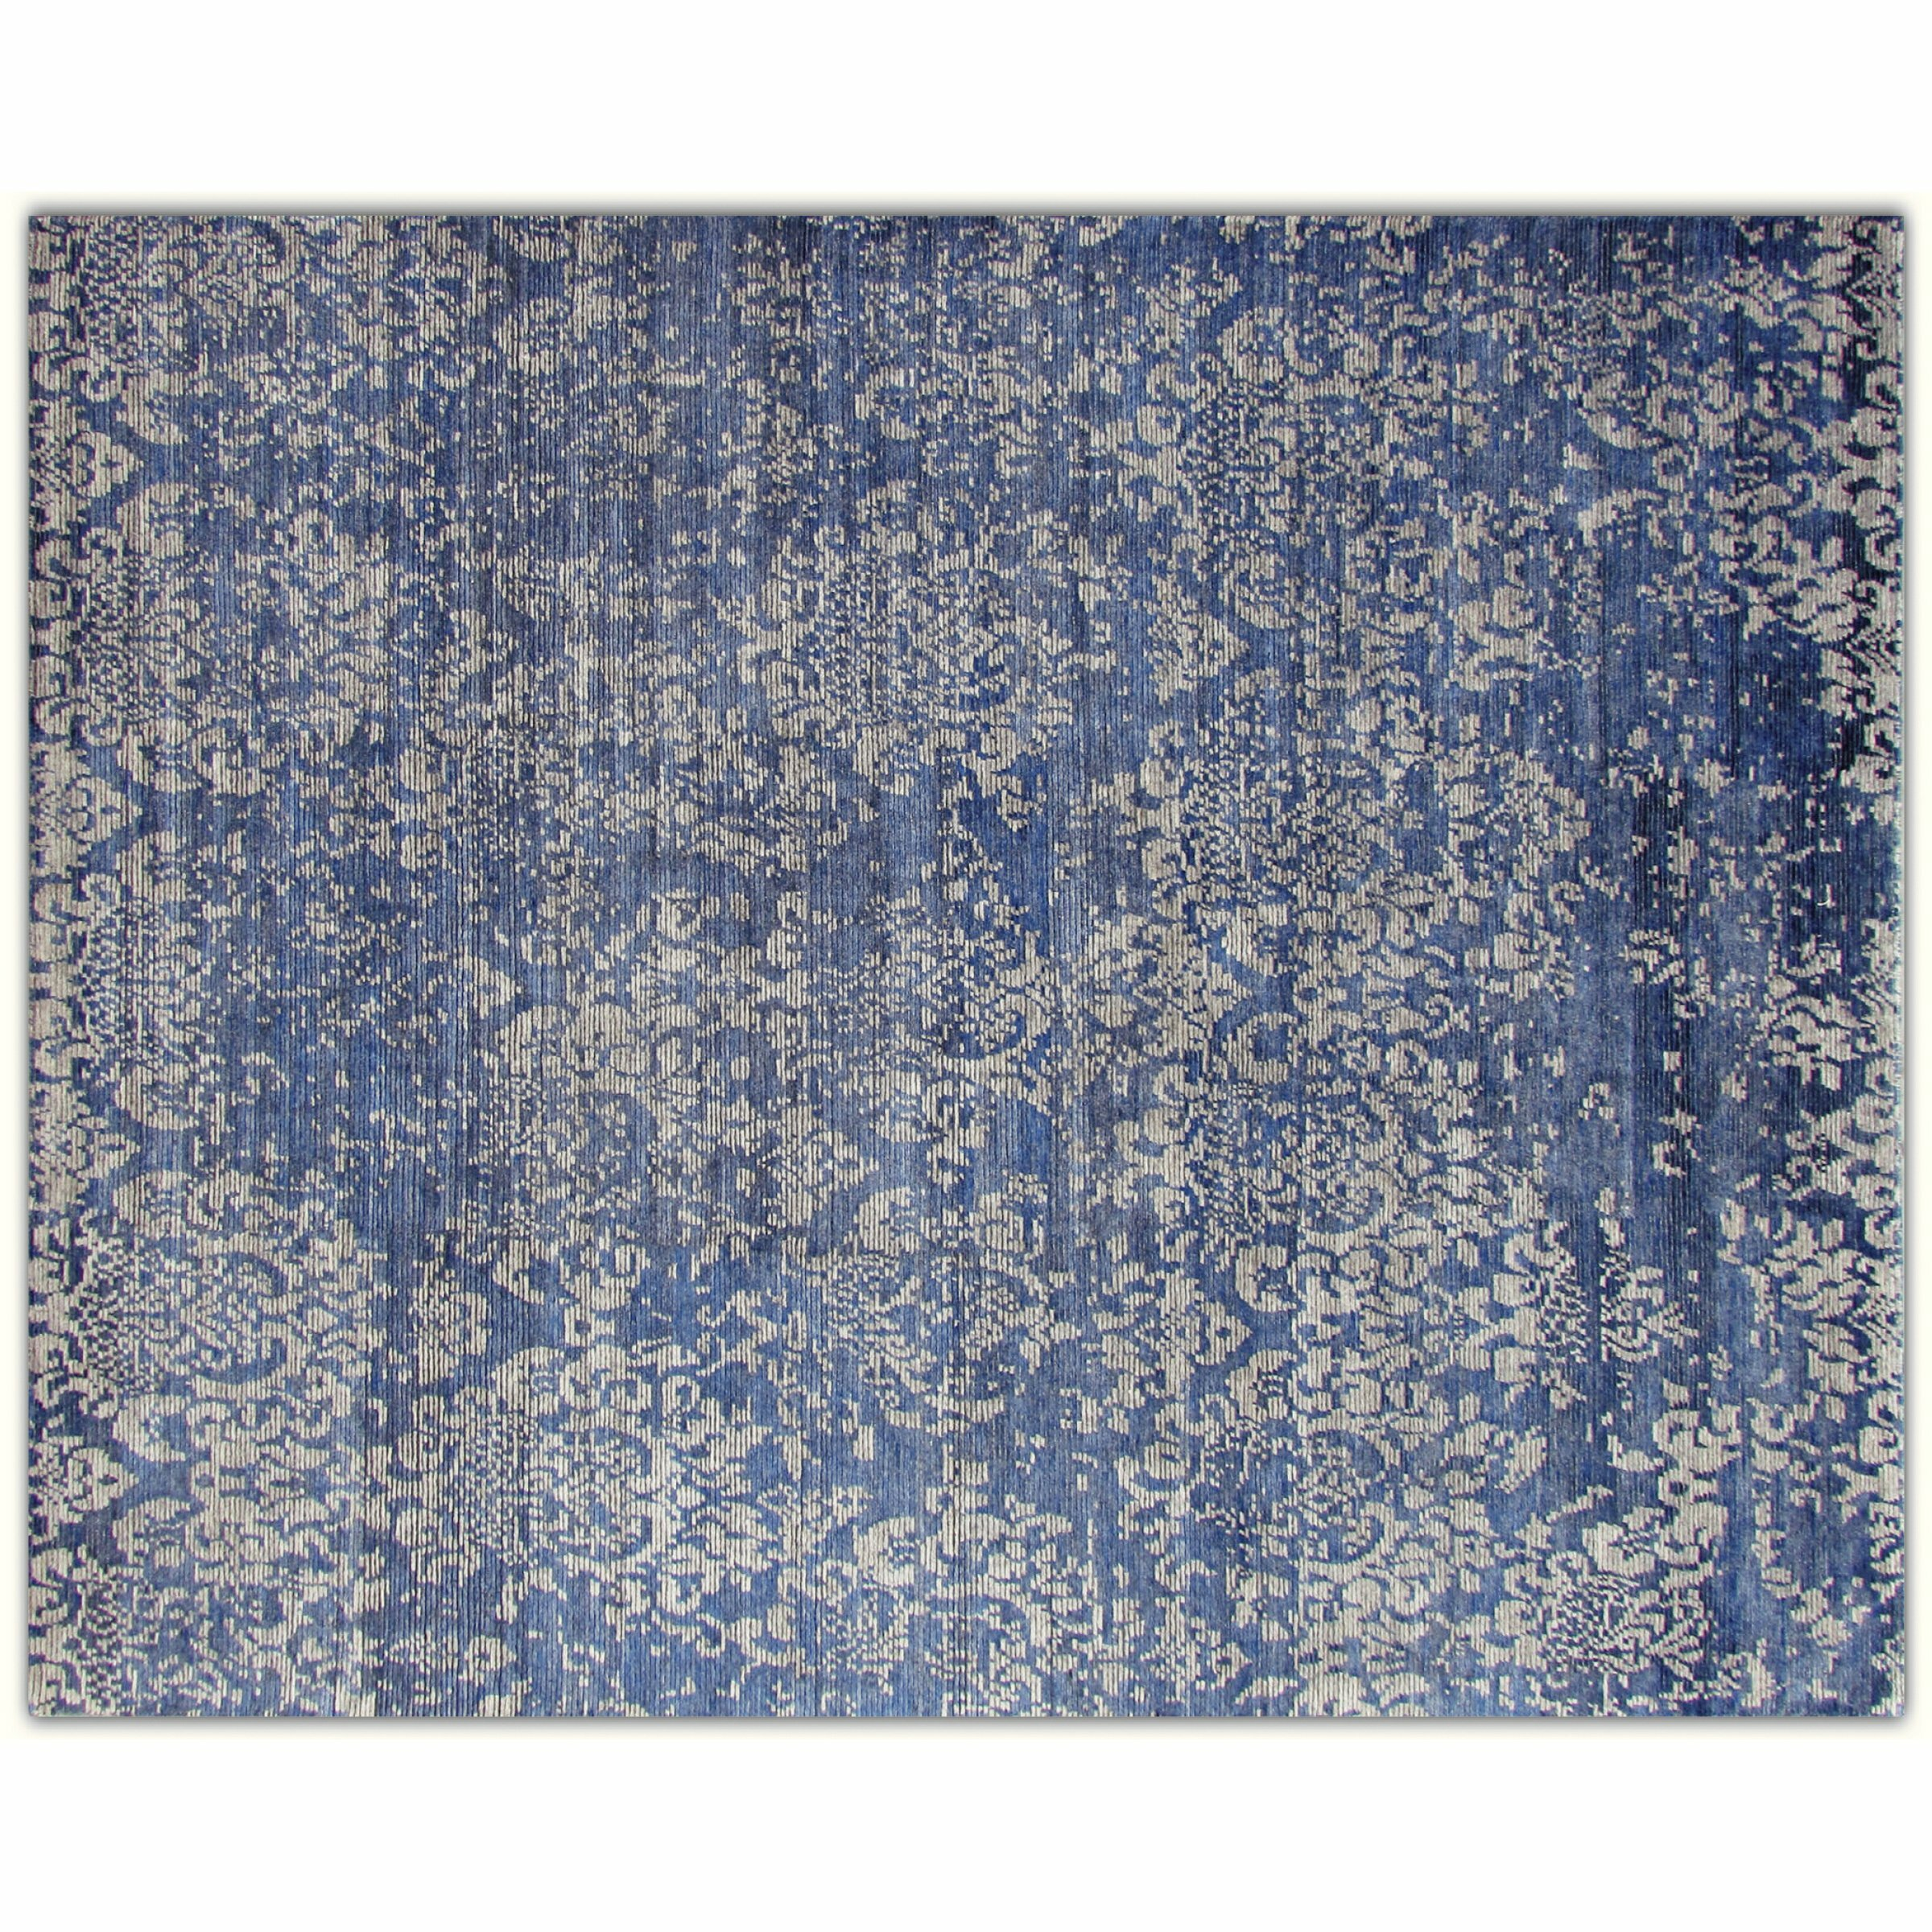 Aga John Oriental Rugs One Of A Kind Hand Knotted Blue 11 9 X 14 11 Area Rug Wayfair